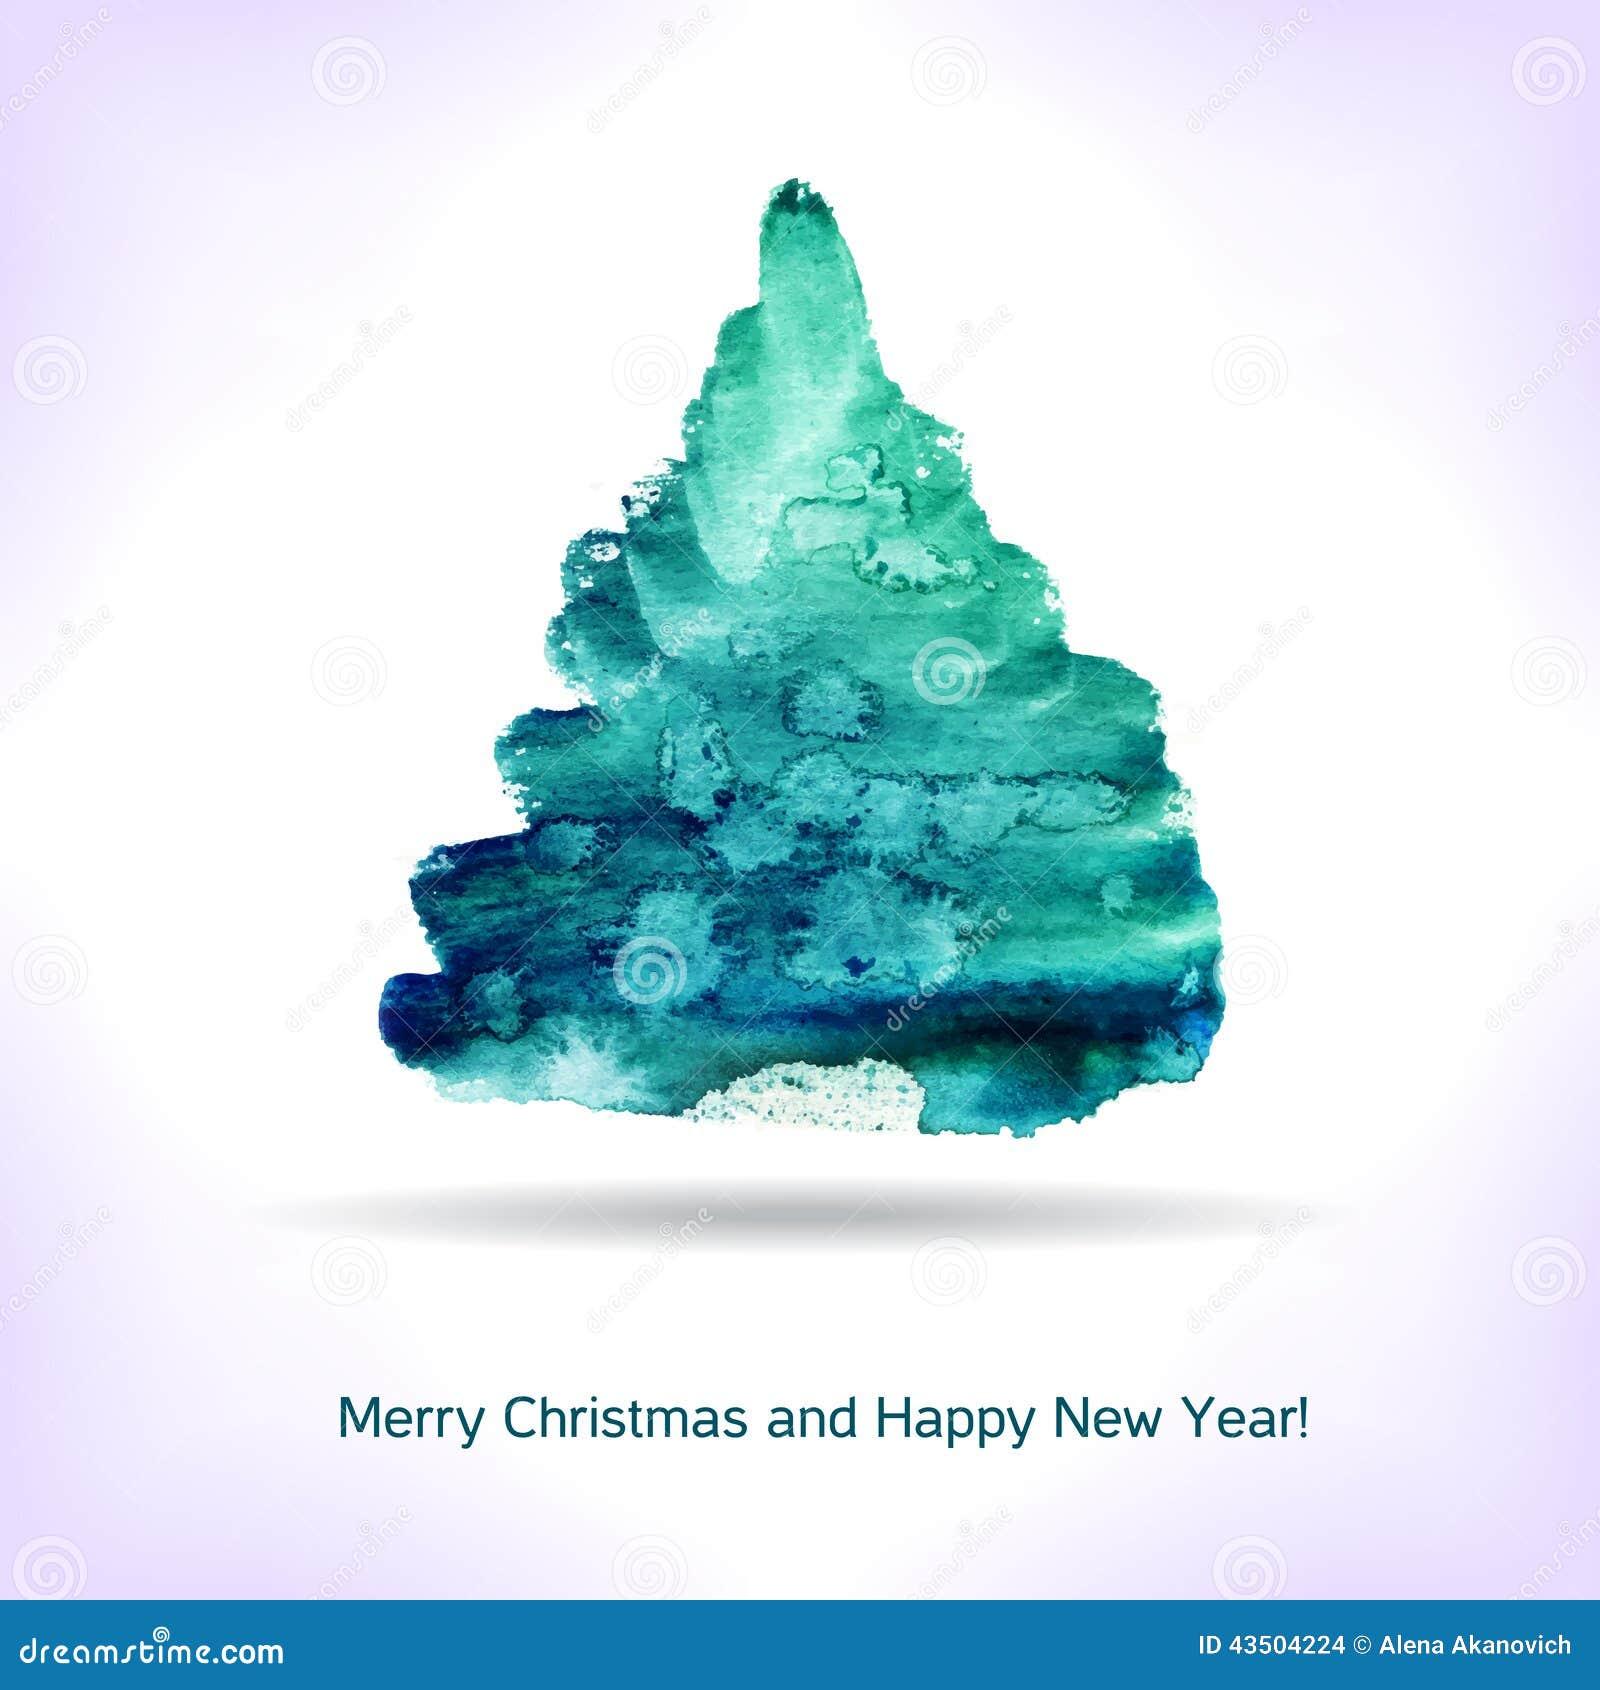 Watercolor Christmas Card. Stock Vector - Image: 43504224